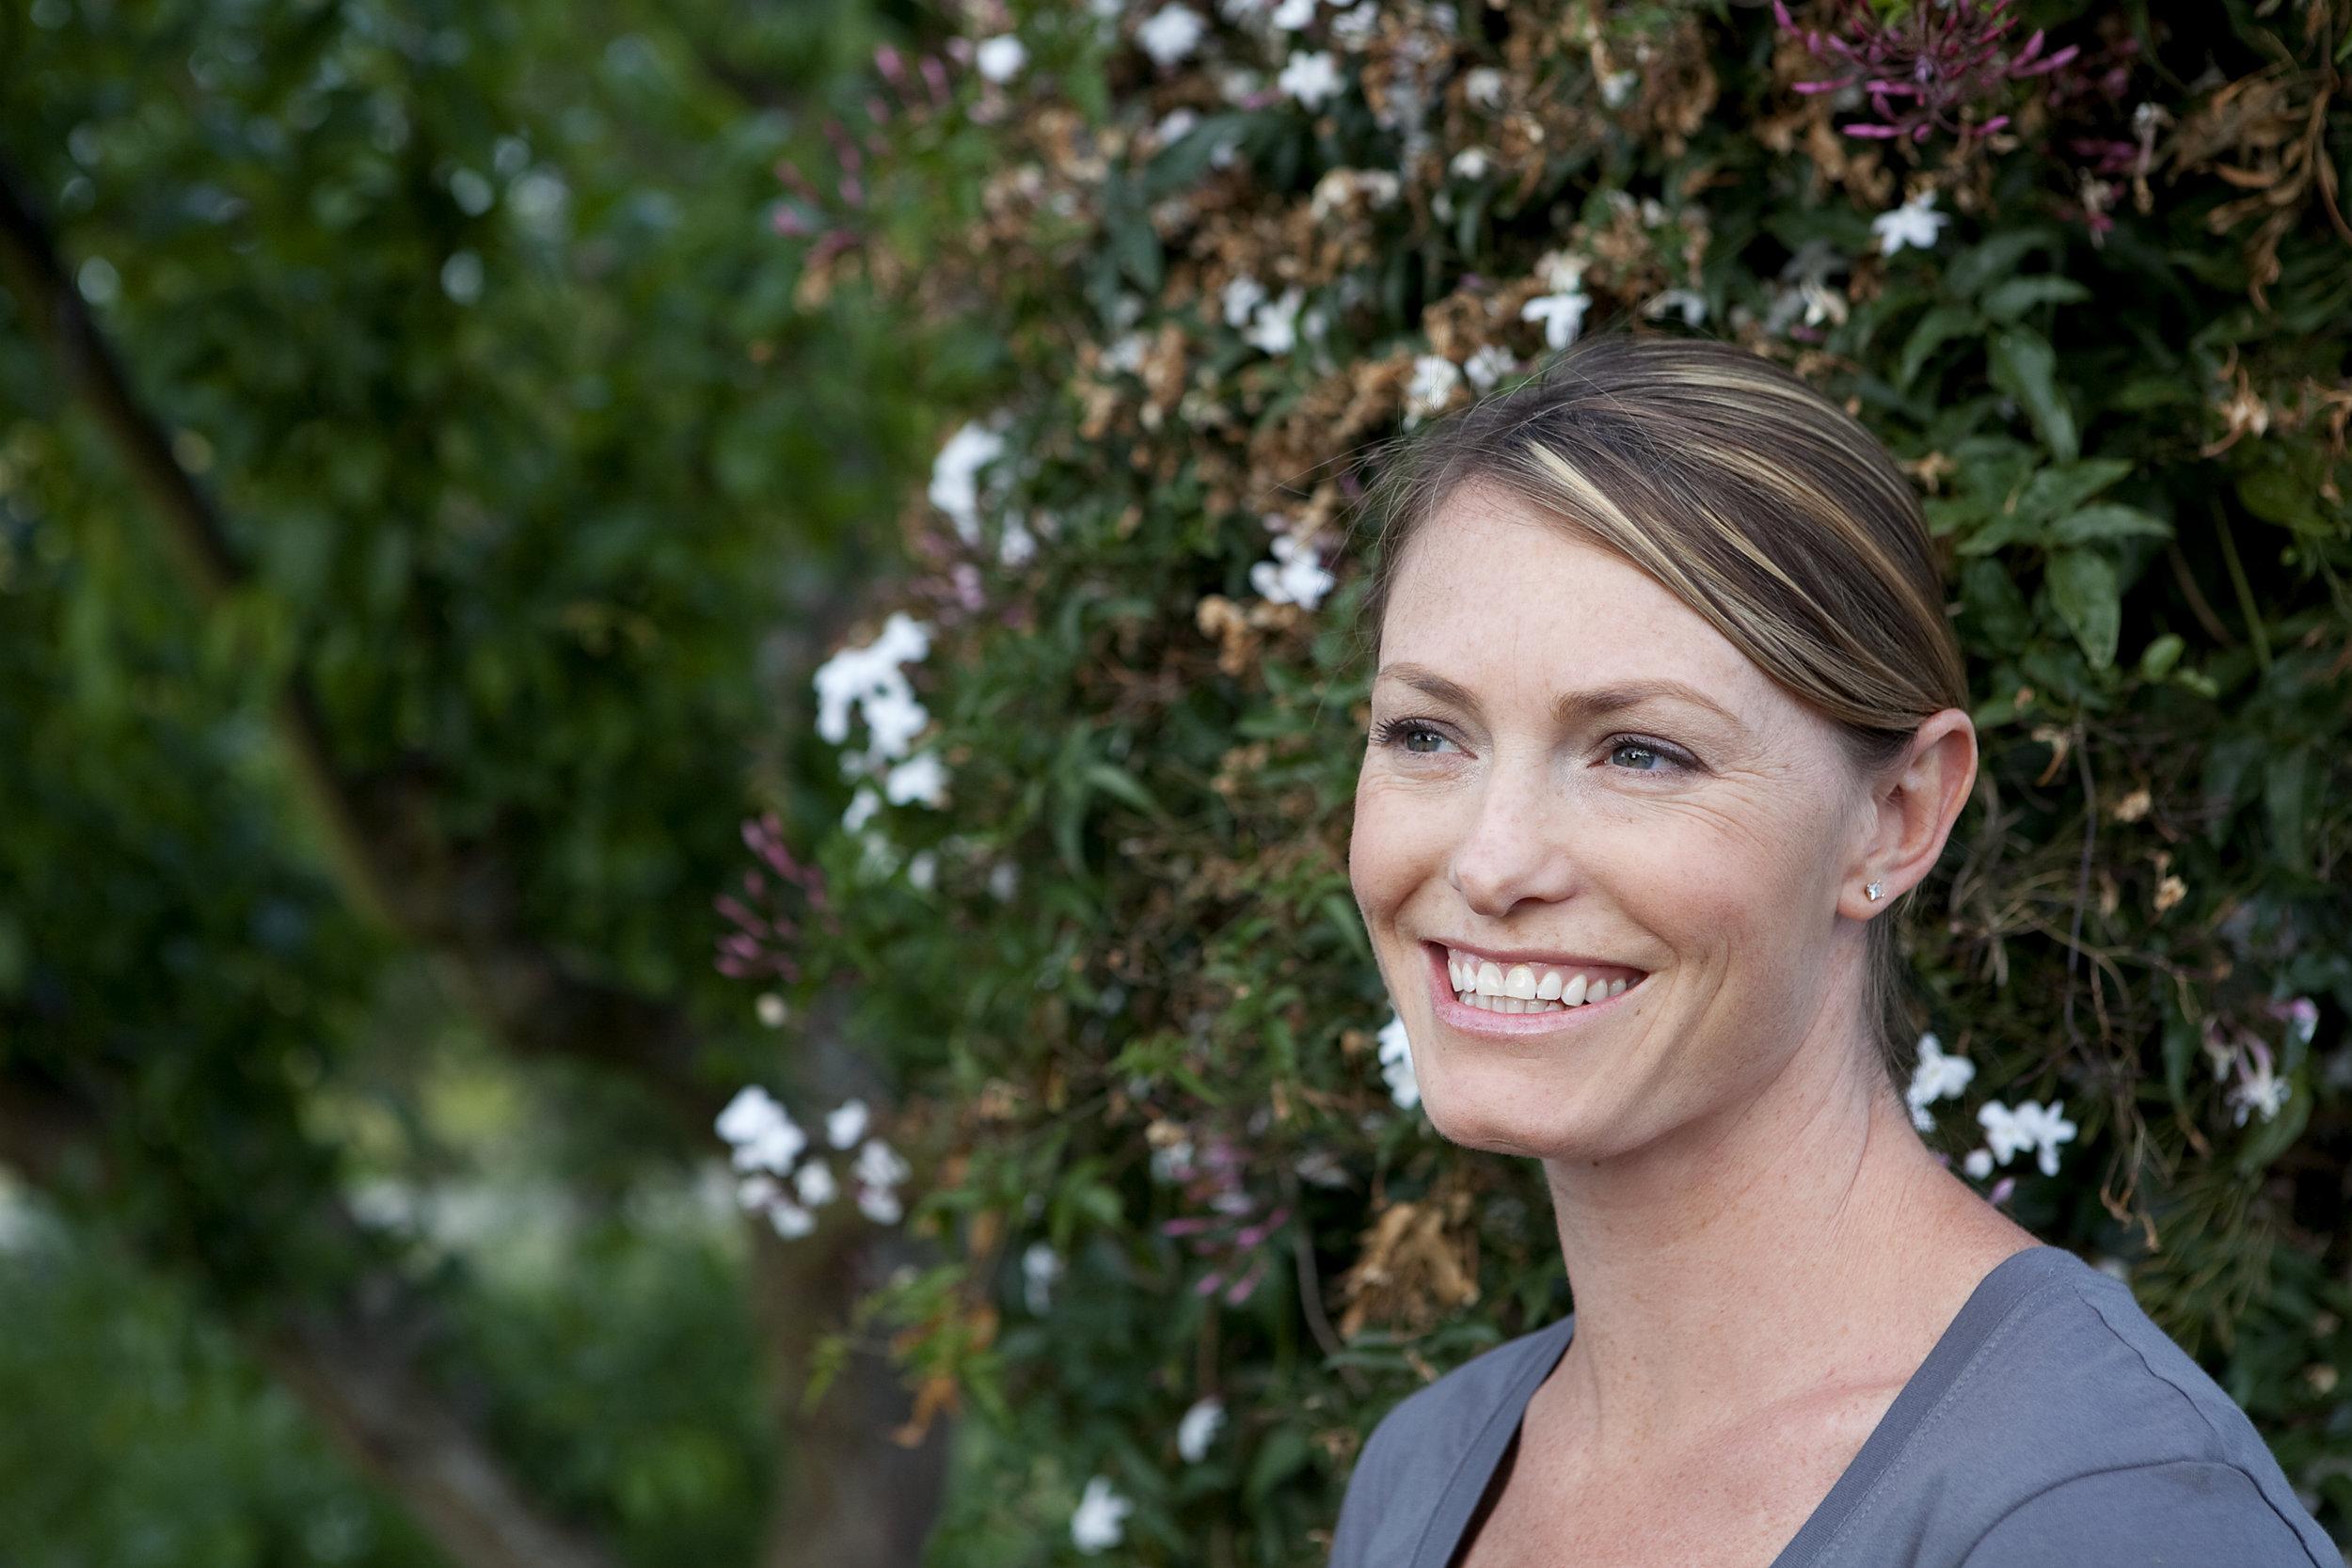 Grace Venus - Founder of Venus Research and Development